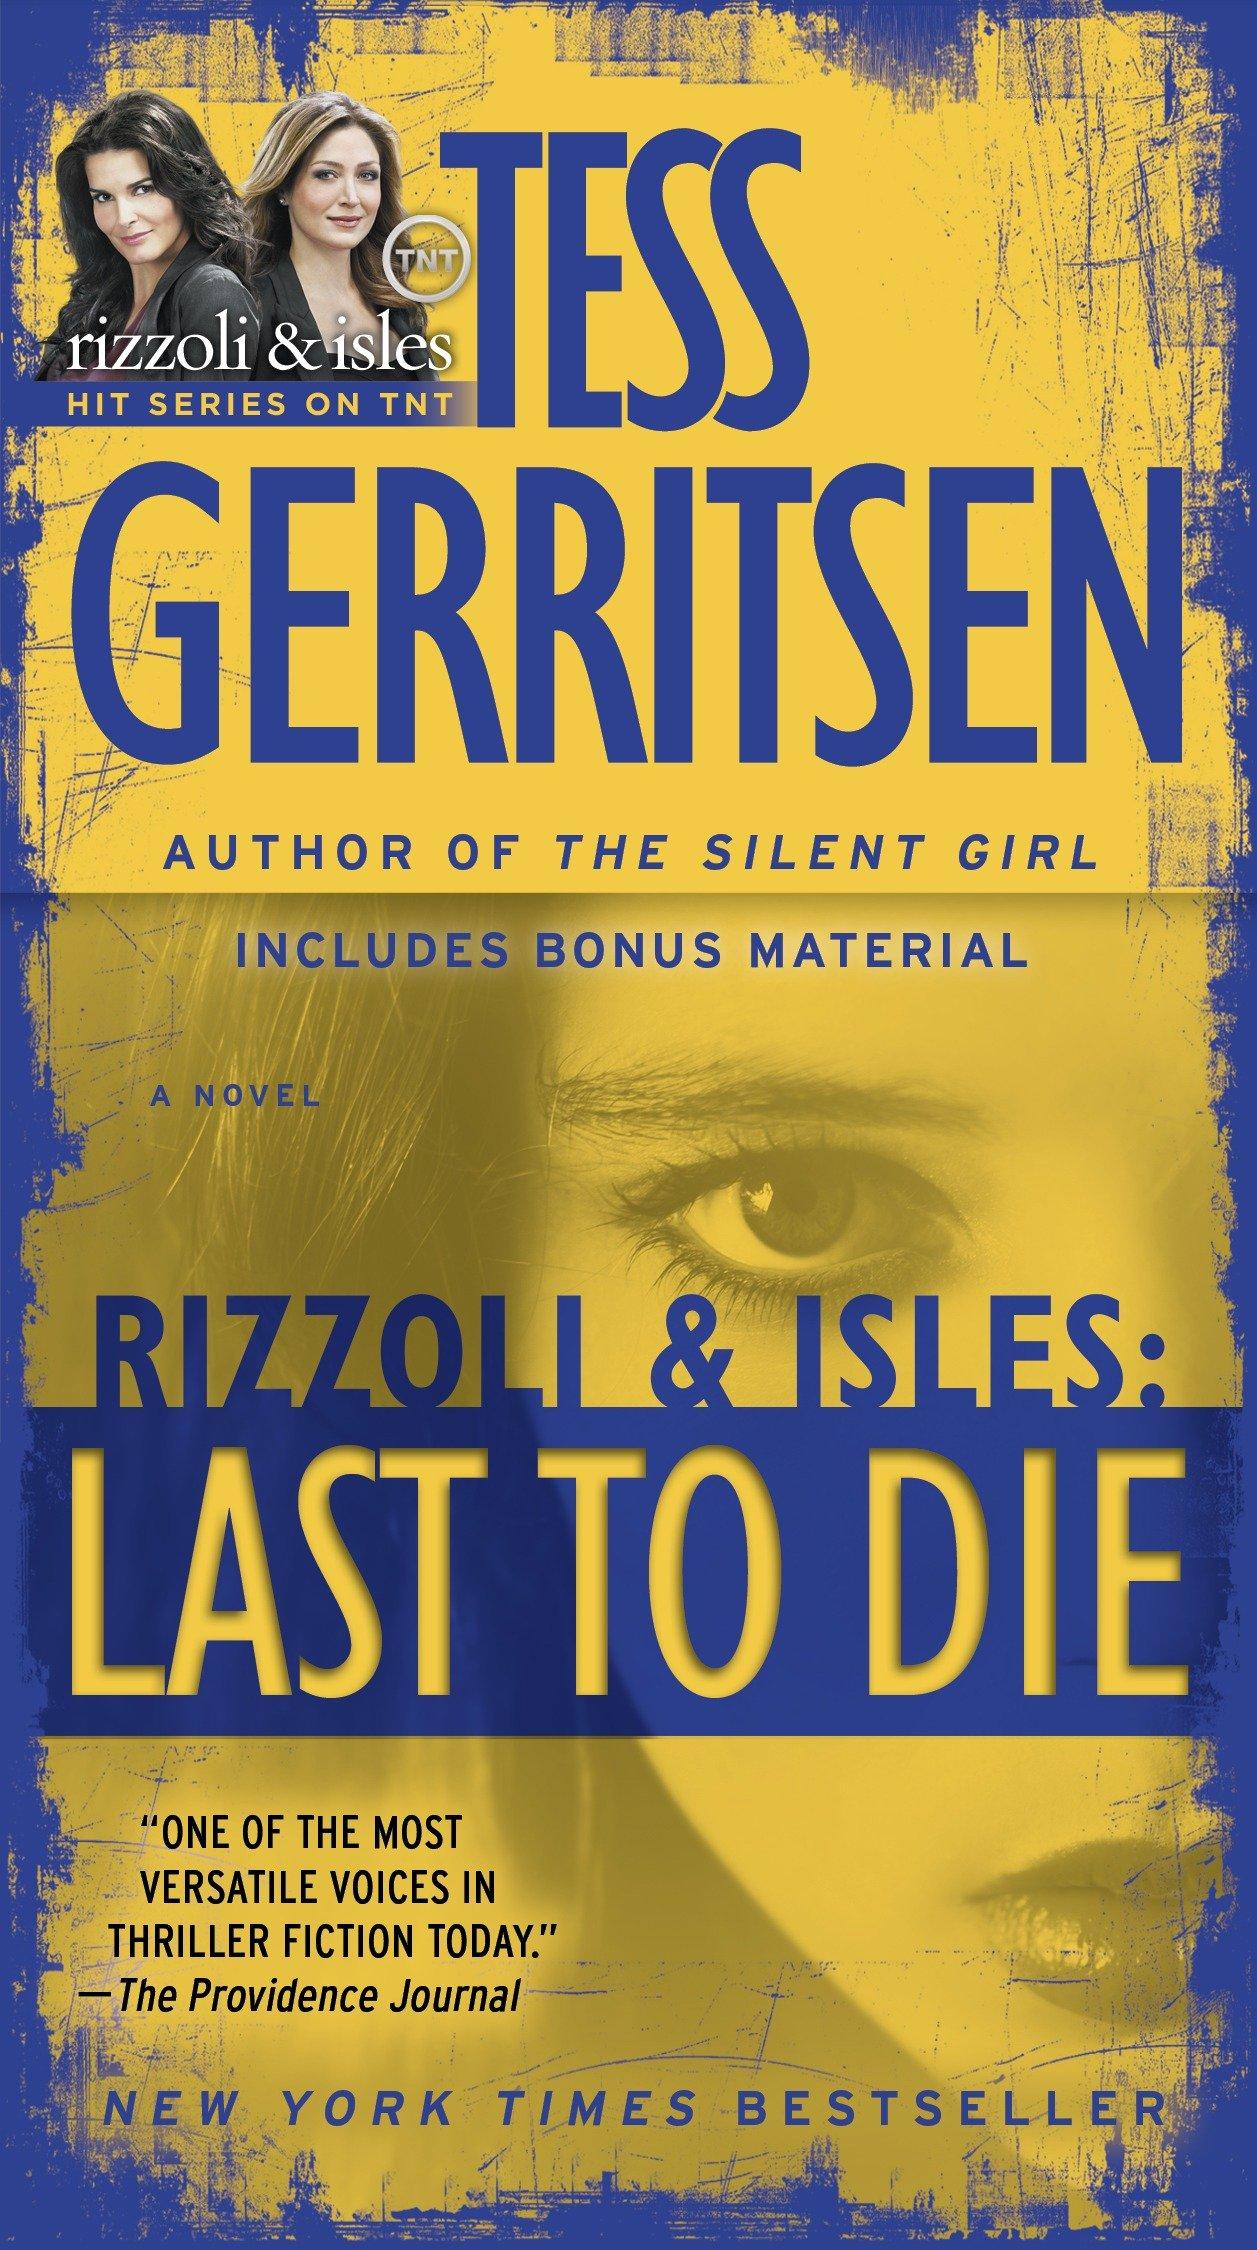 Cover Image of Last to Die (with bonus short story John Doe)